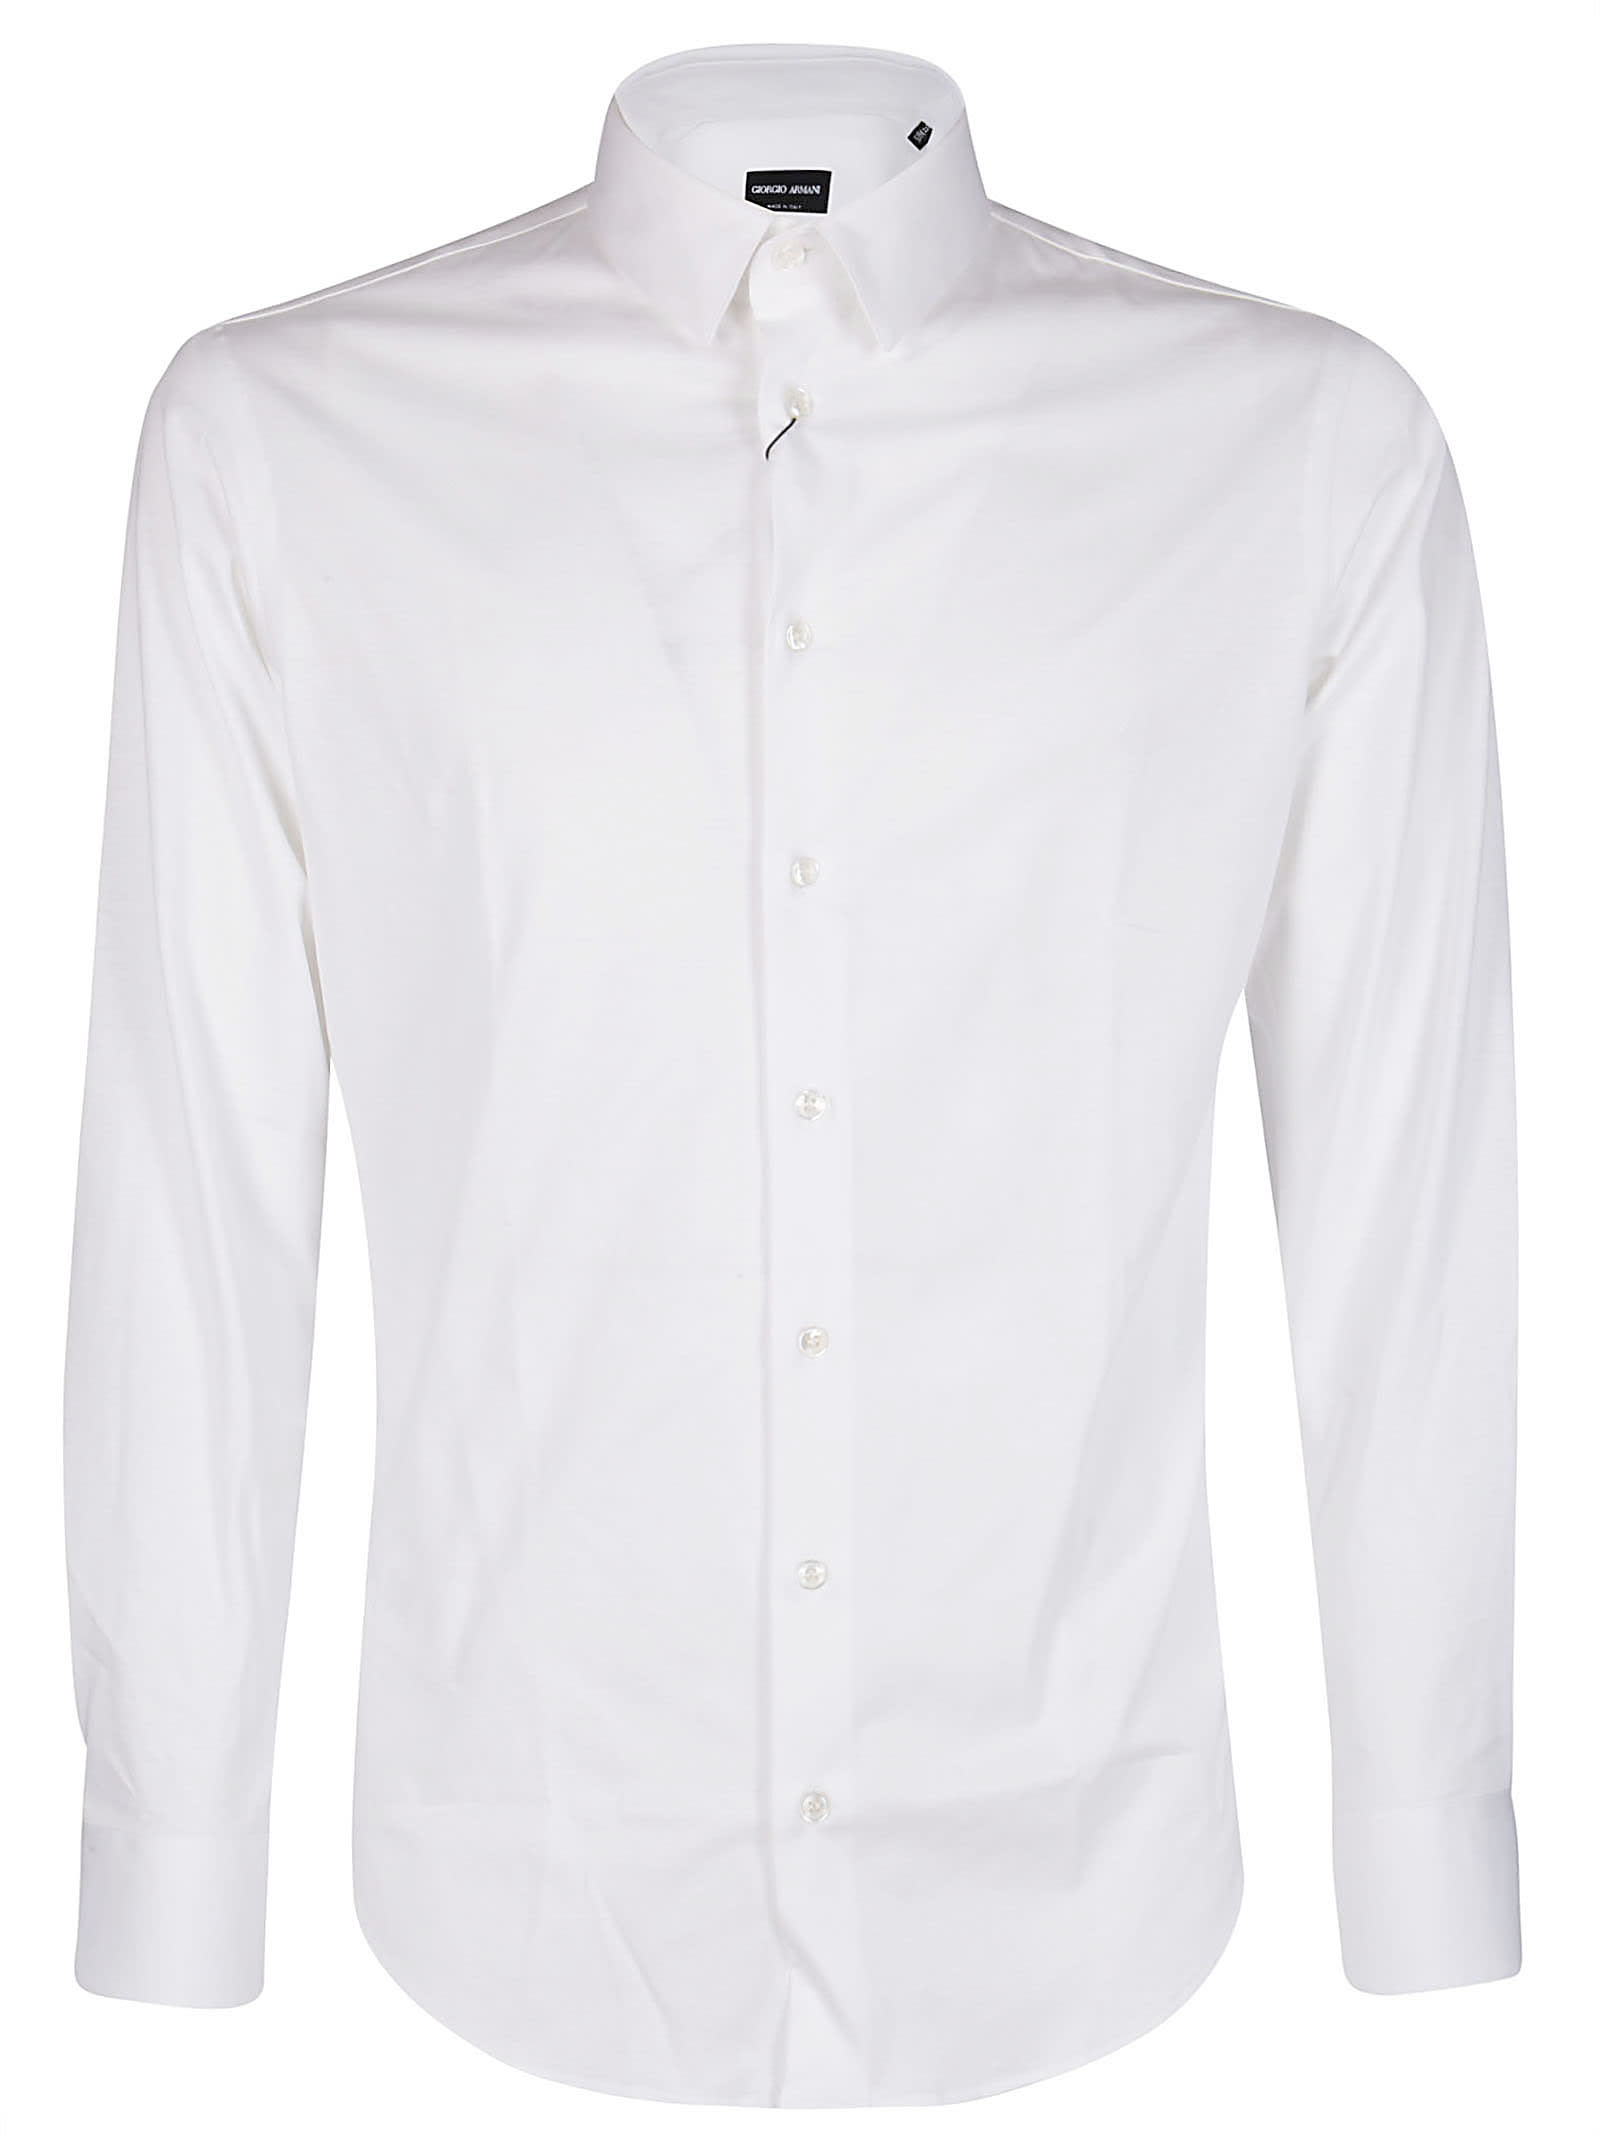 Giorgio Armani White Cotton Shirt